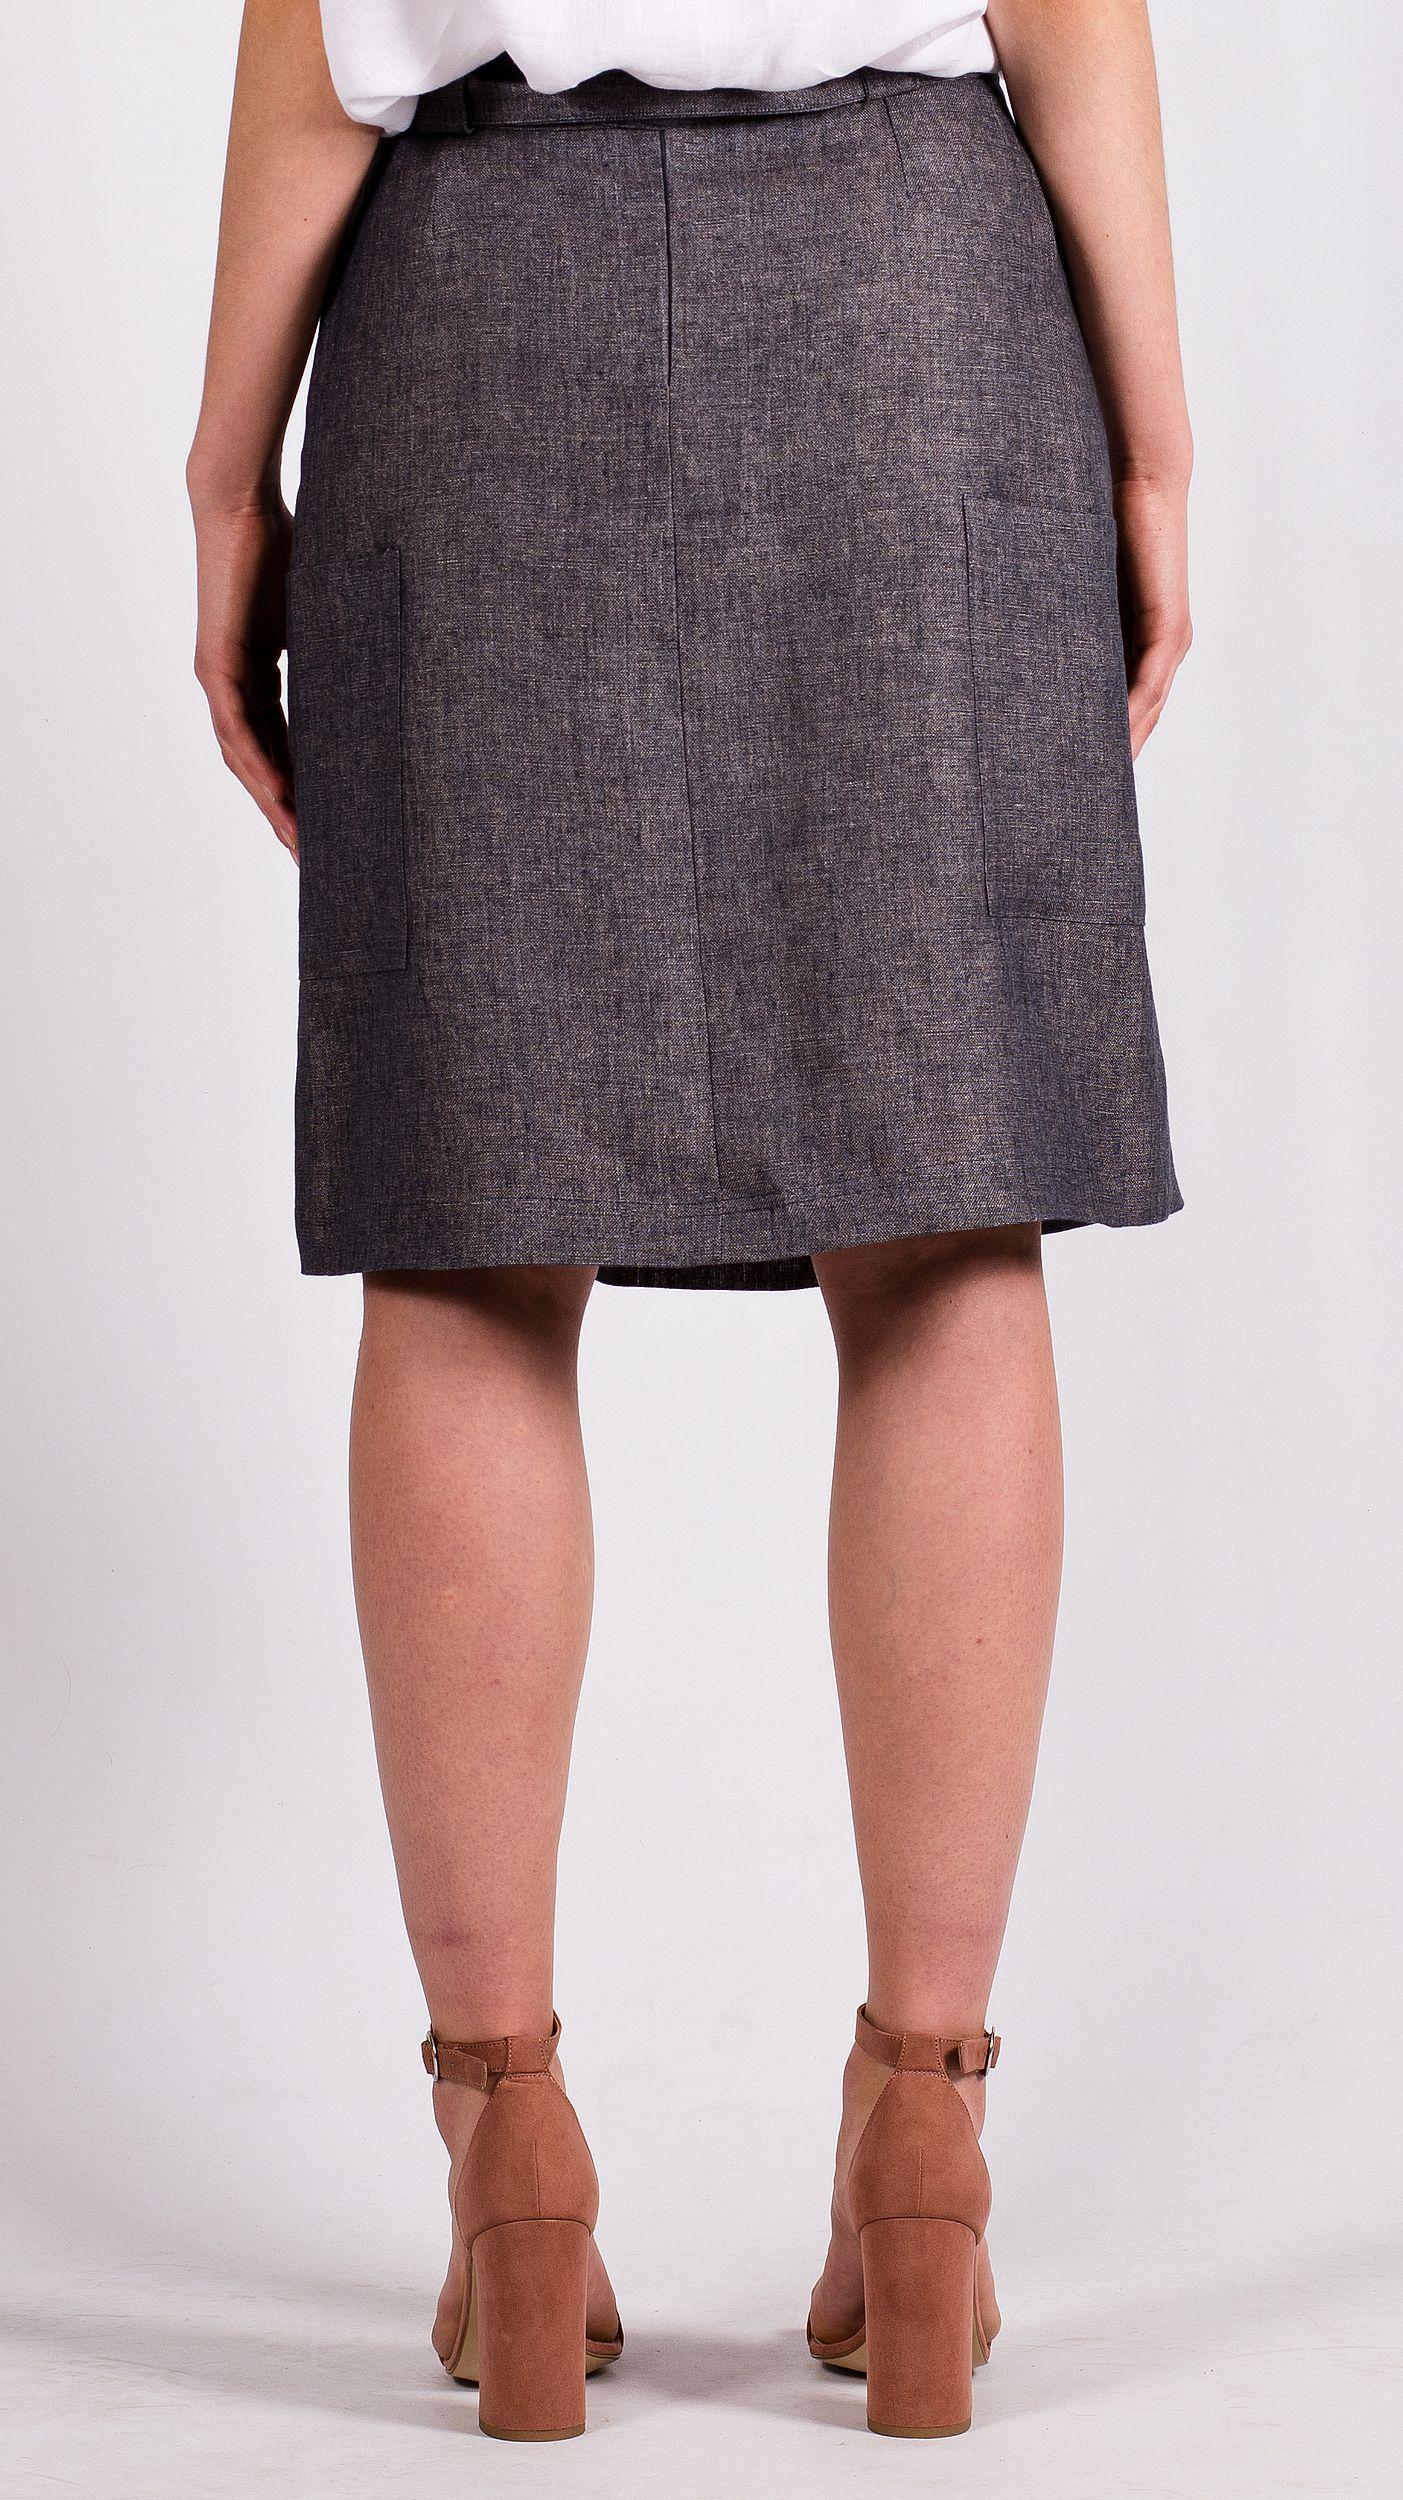 Grey linen skirt